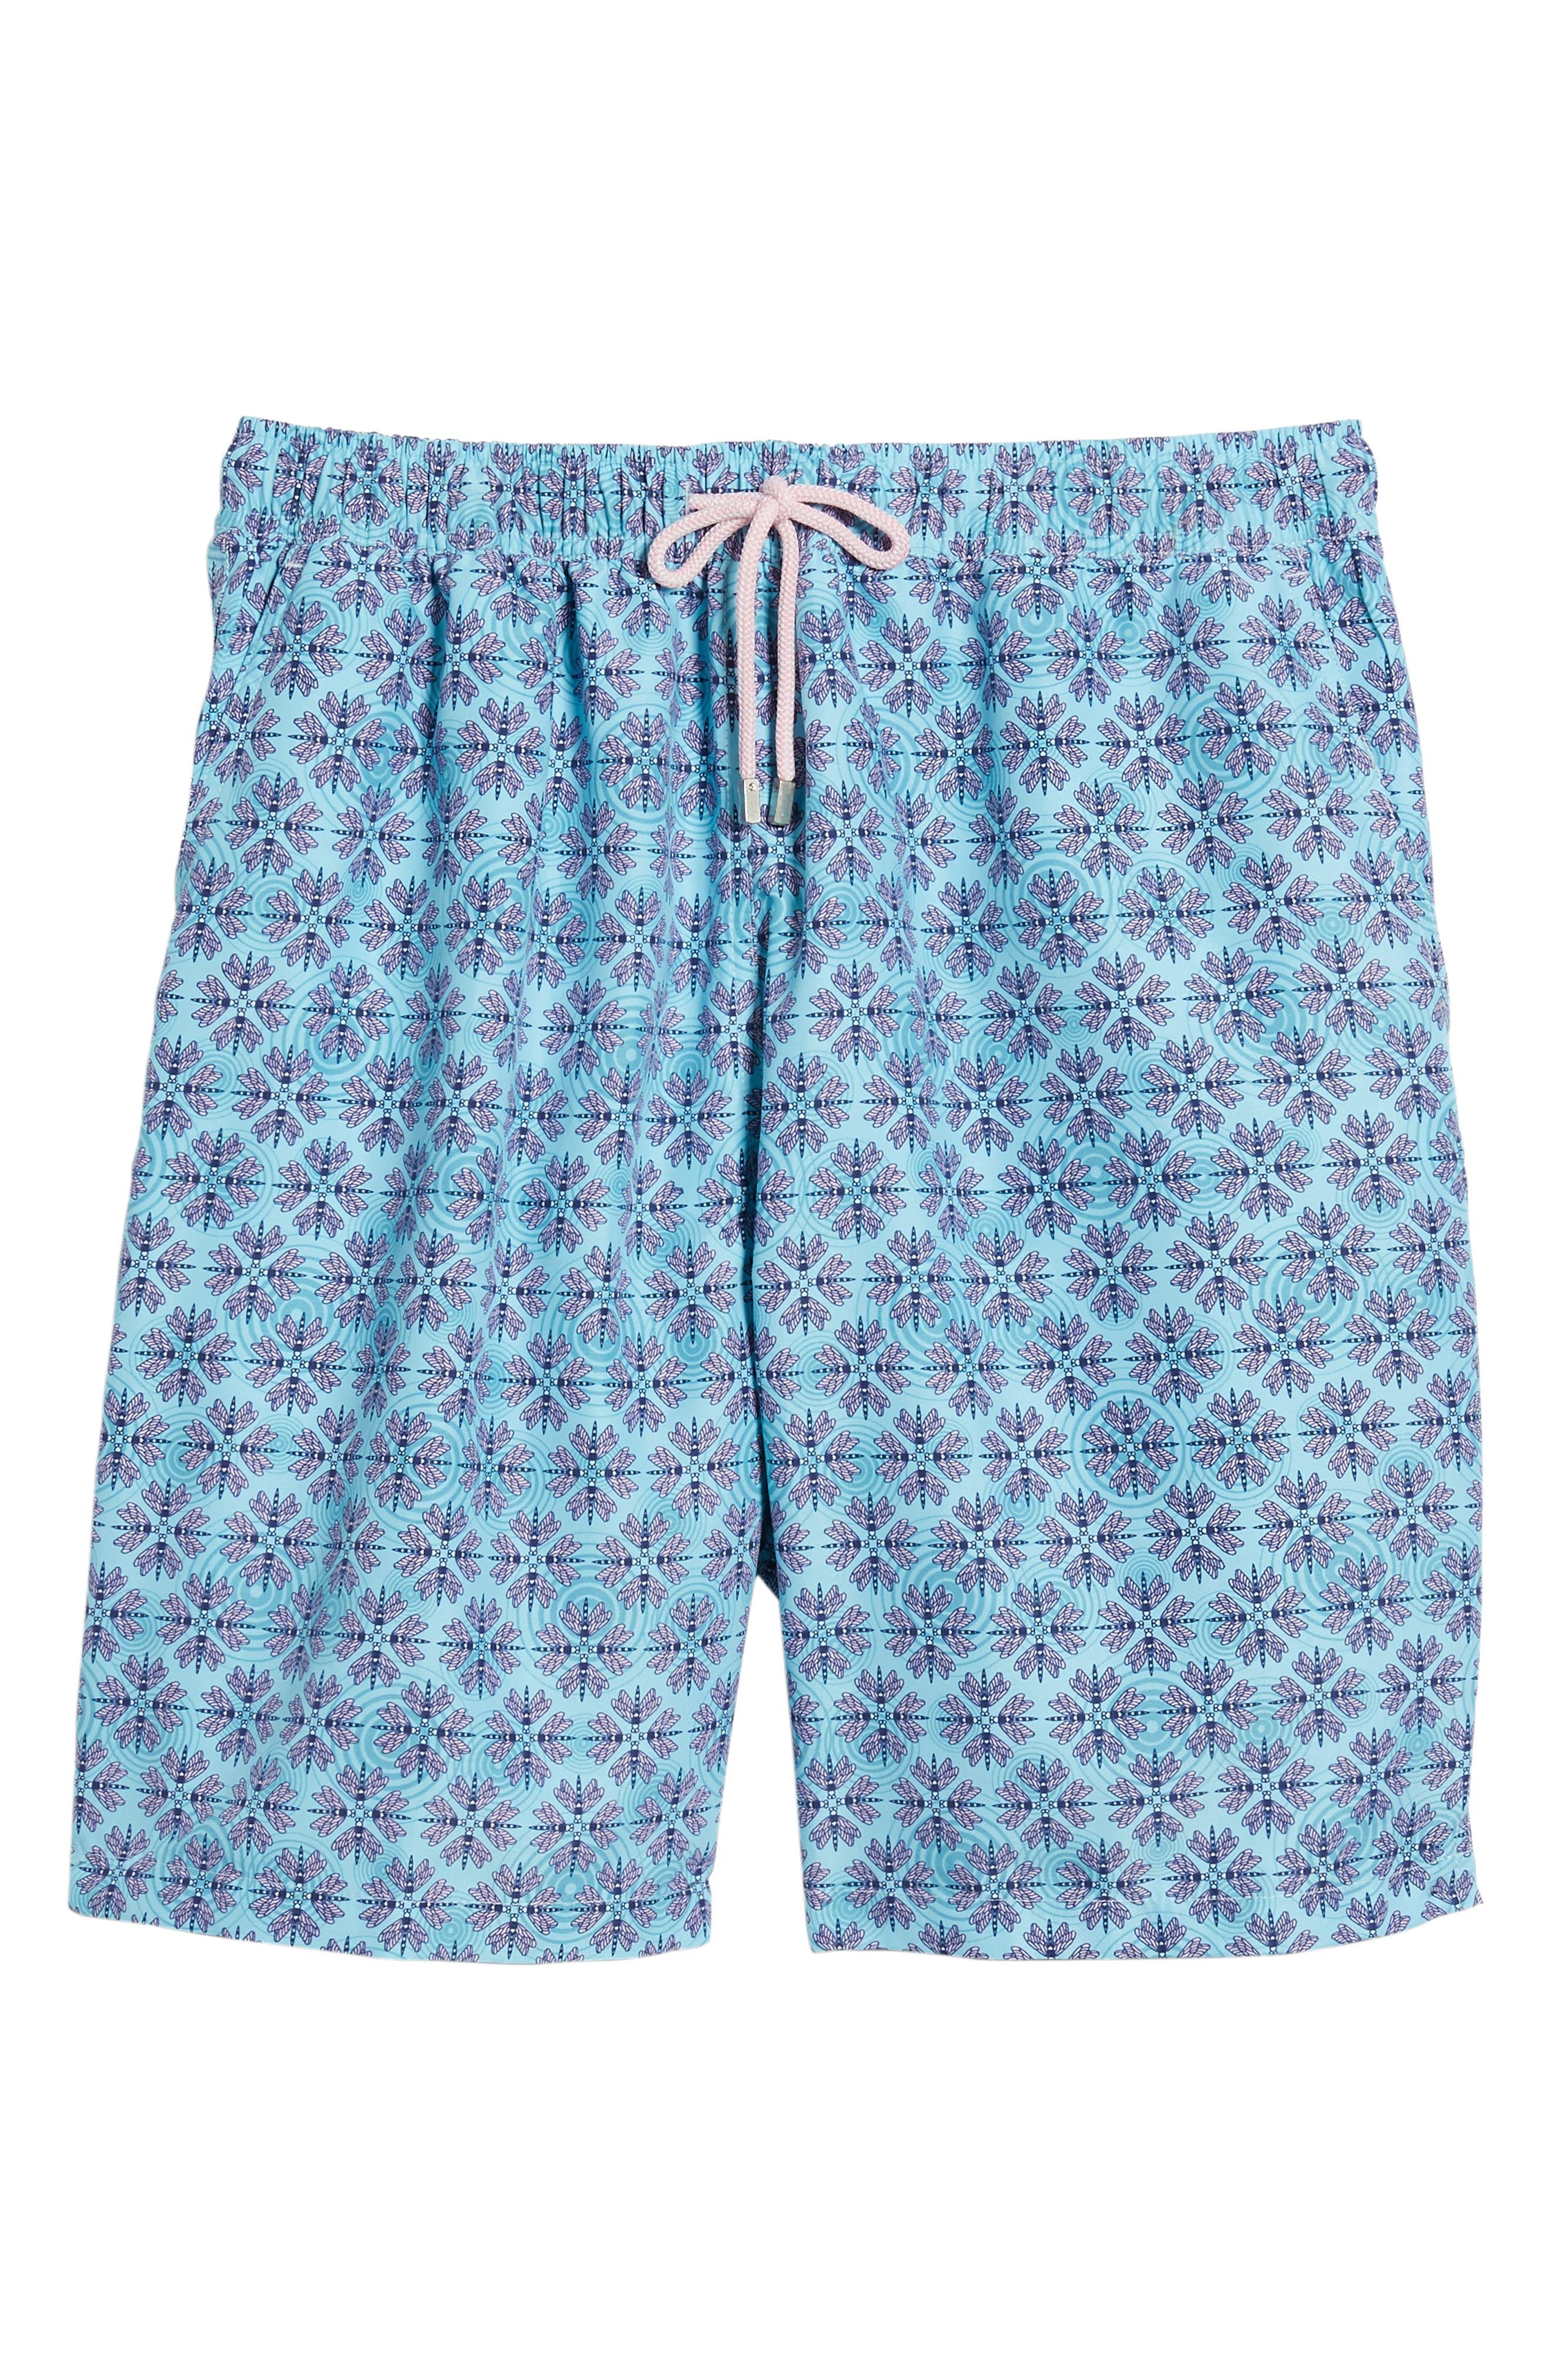 Dragonflies Swim Shorts,                             Alternate thumbnail 6, color,                             427